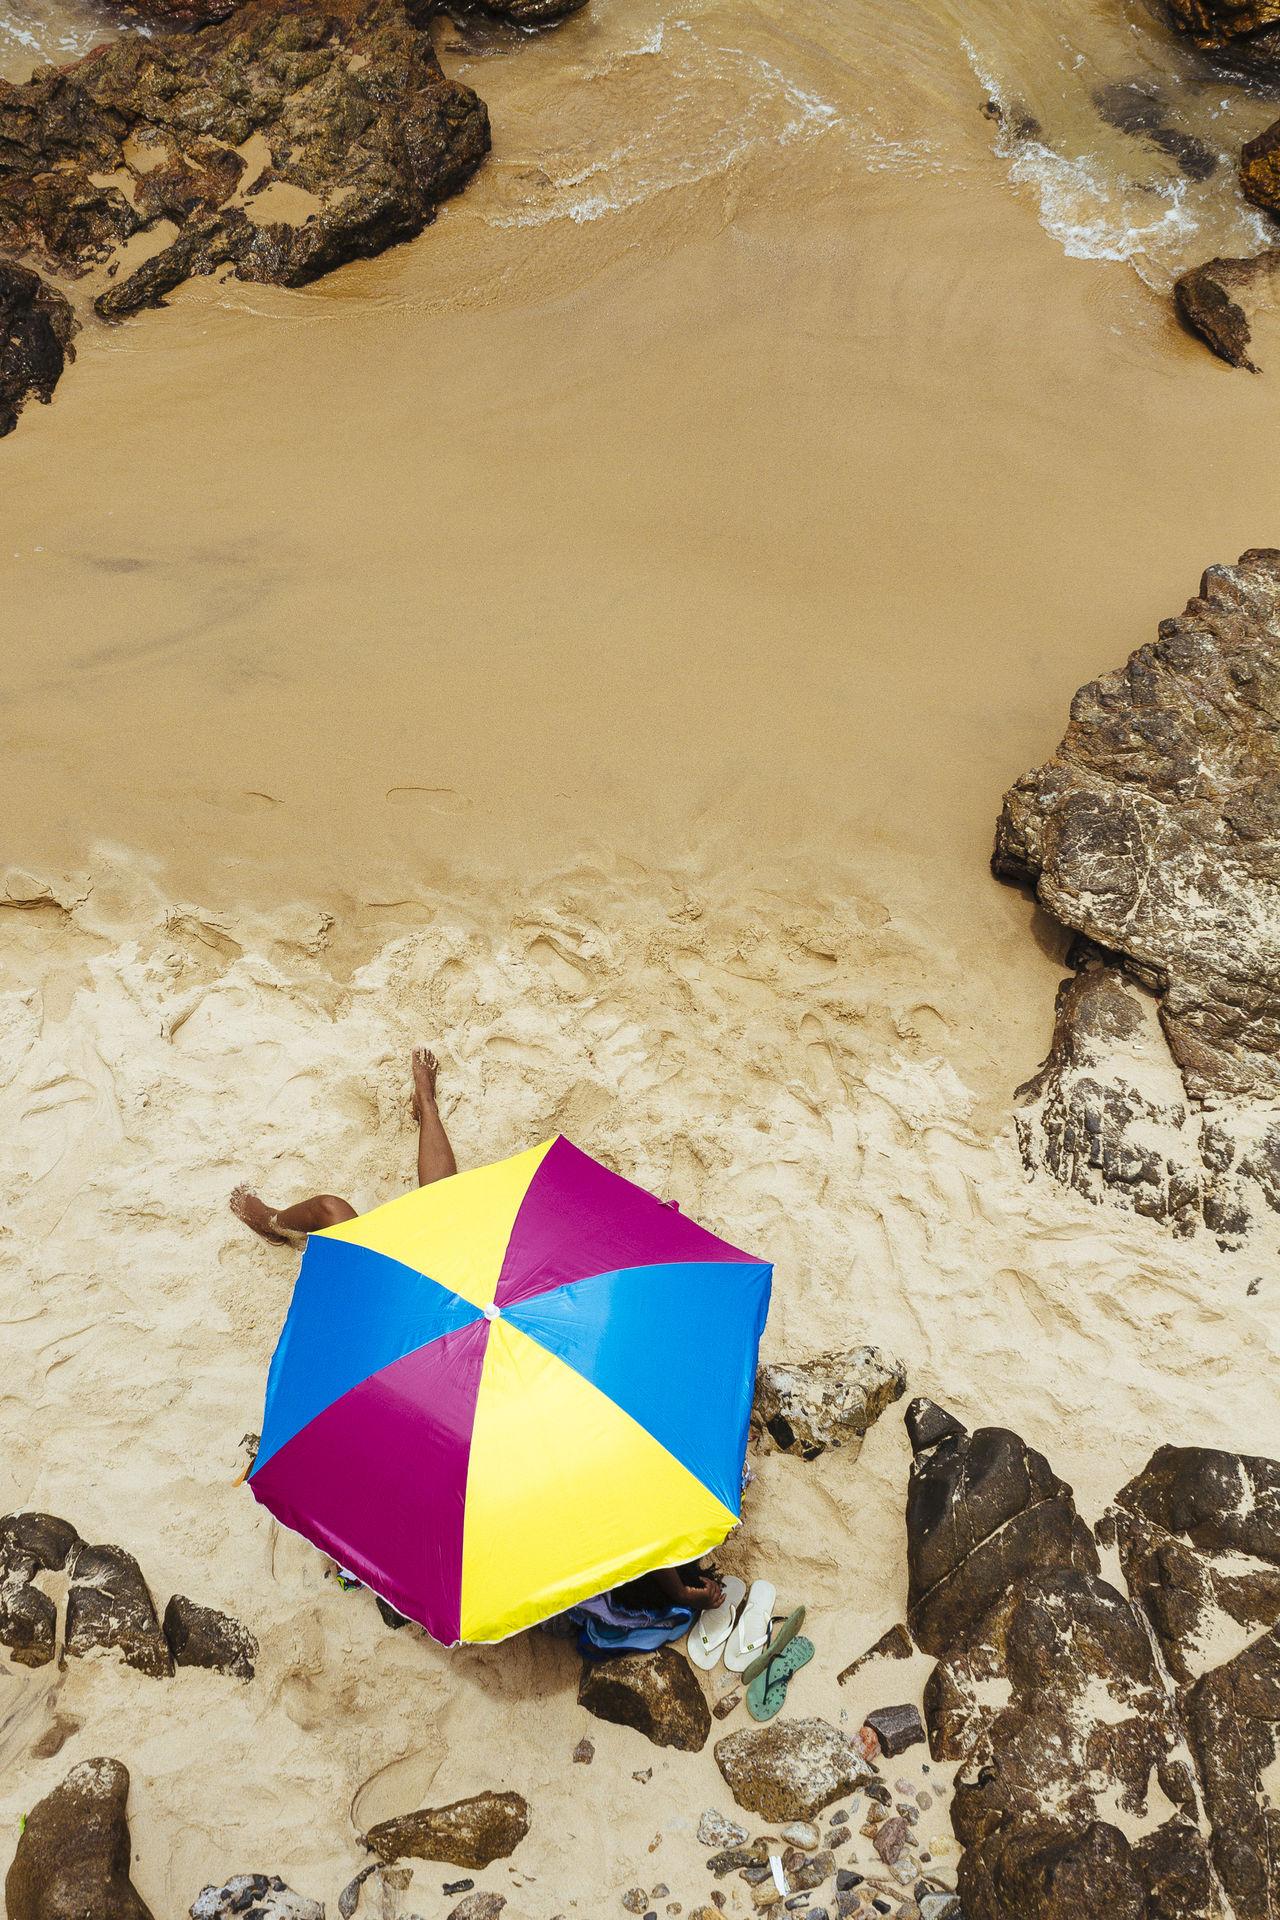 High angle view of umbrella on beach